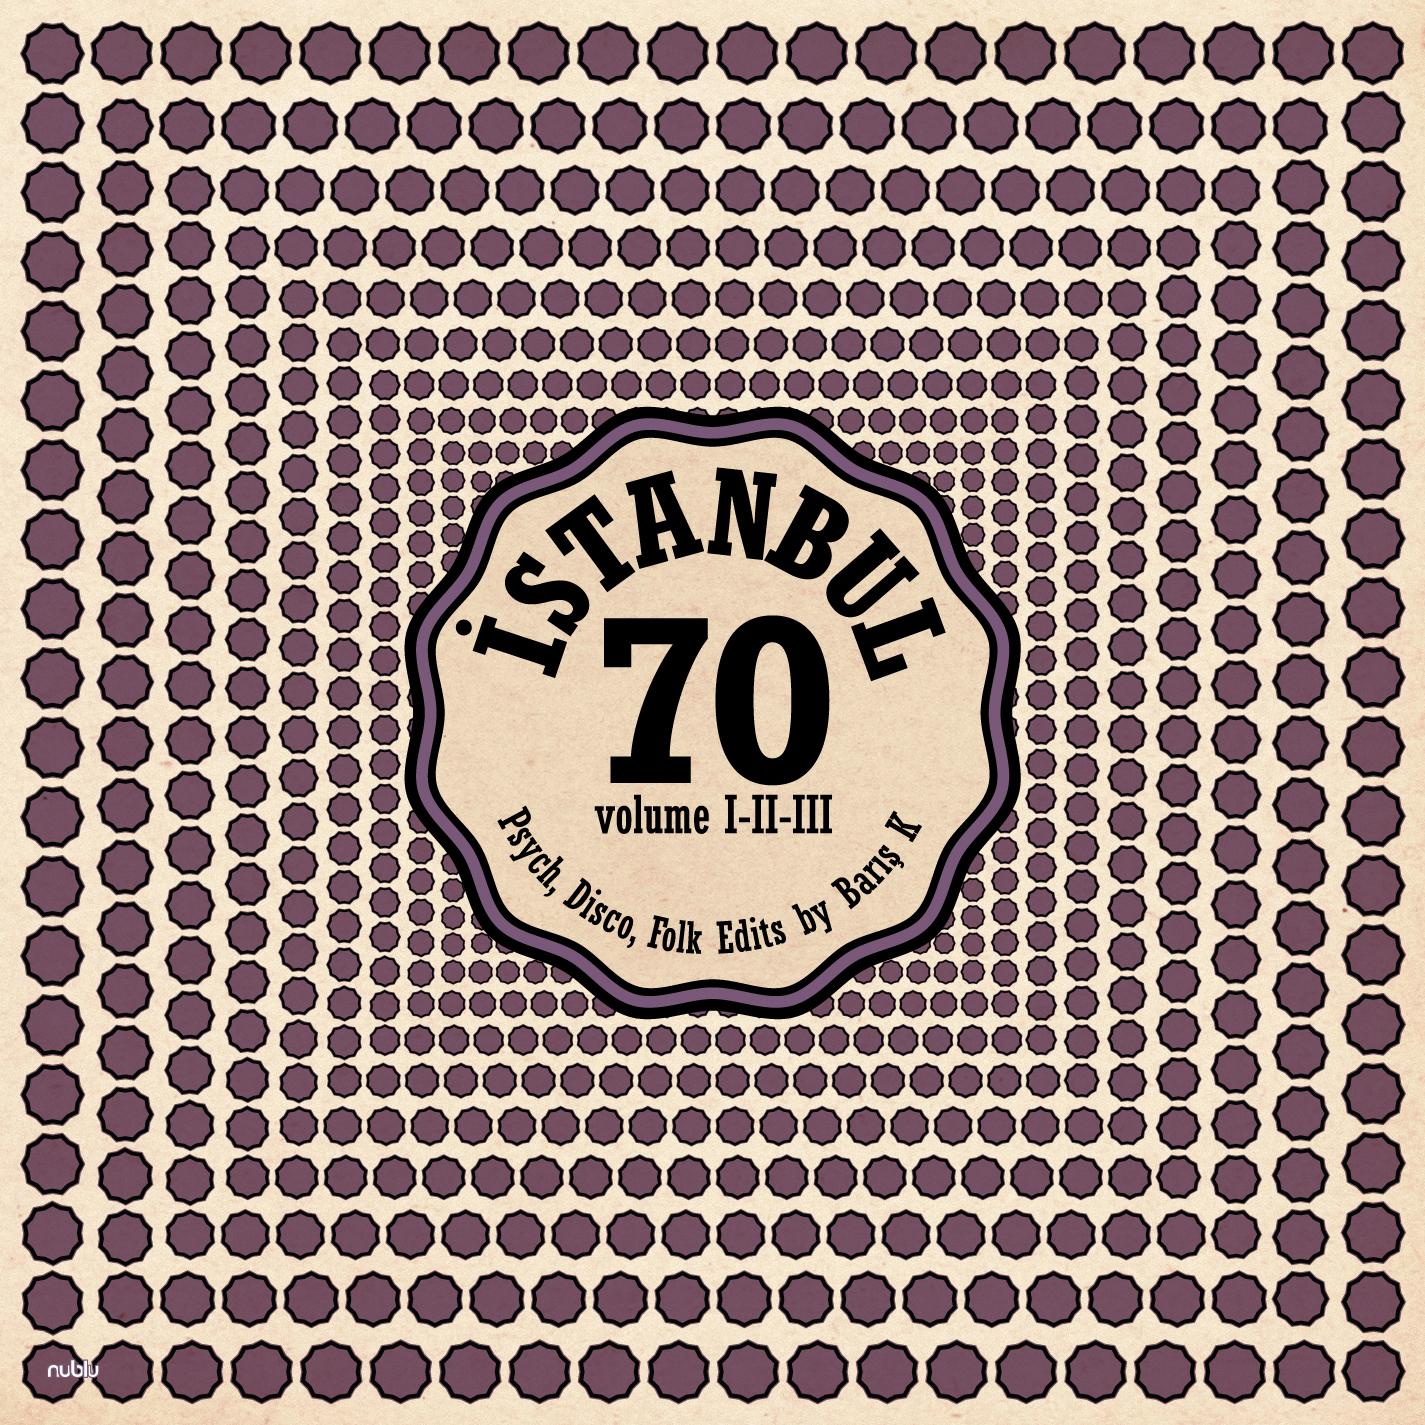 Istanbul 70/PSYCH DISCO EDITS VOL 1-3 CD